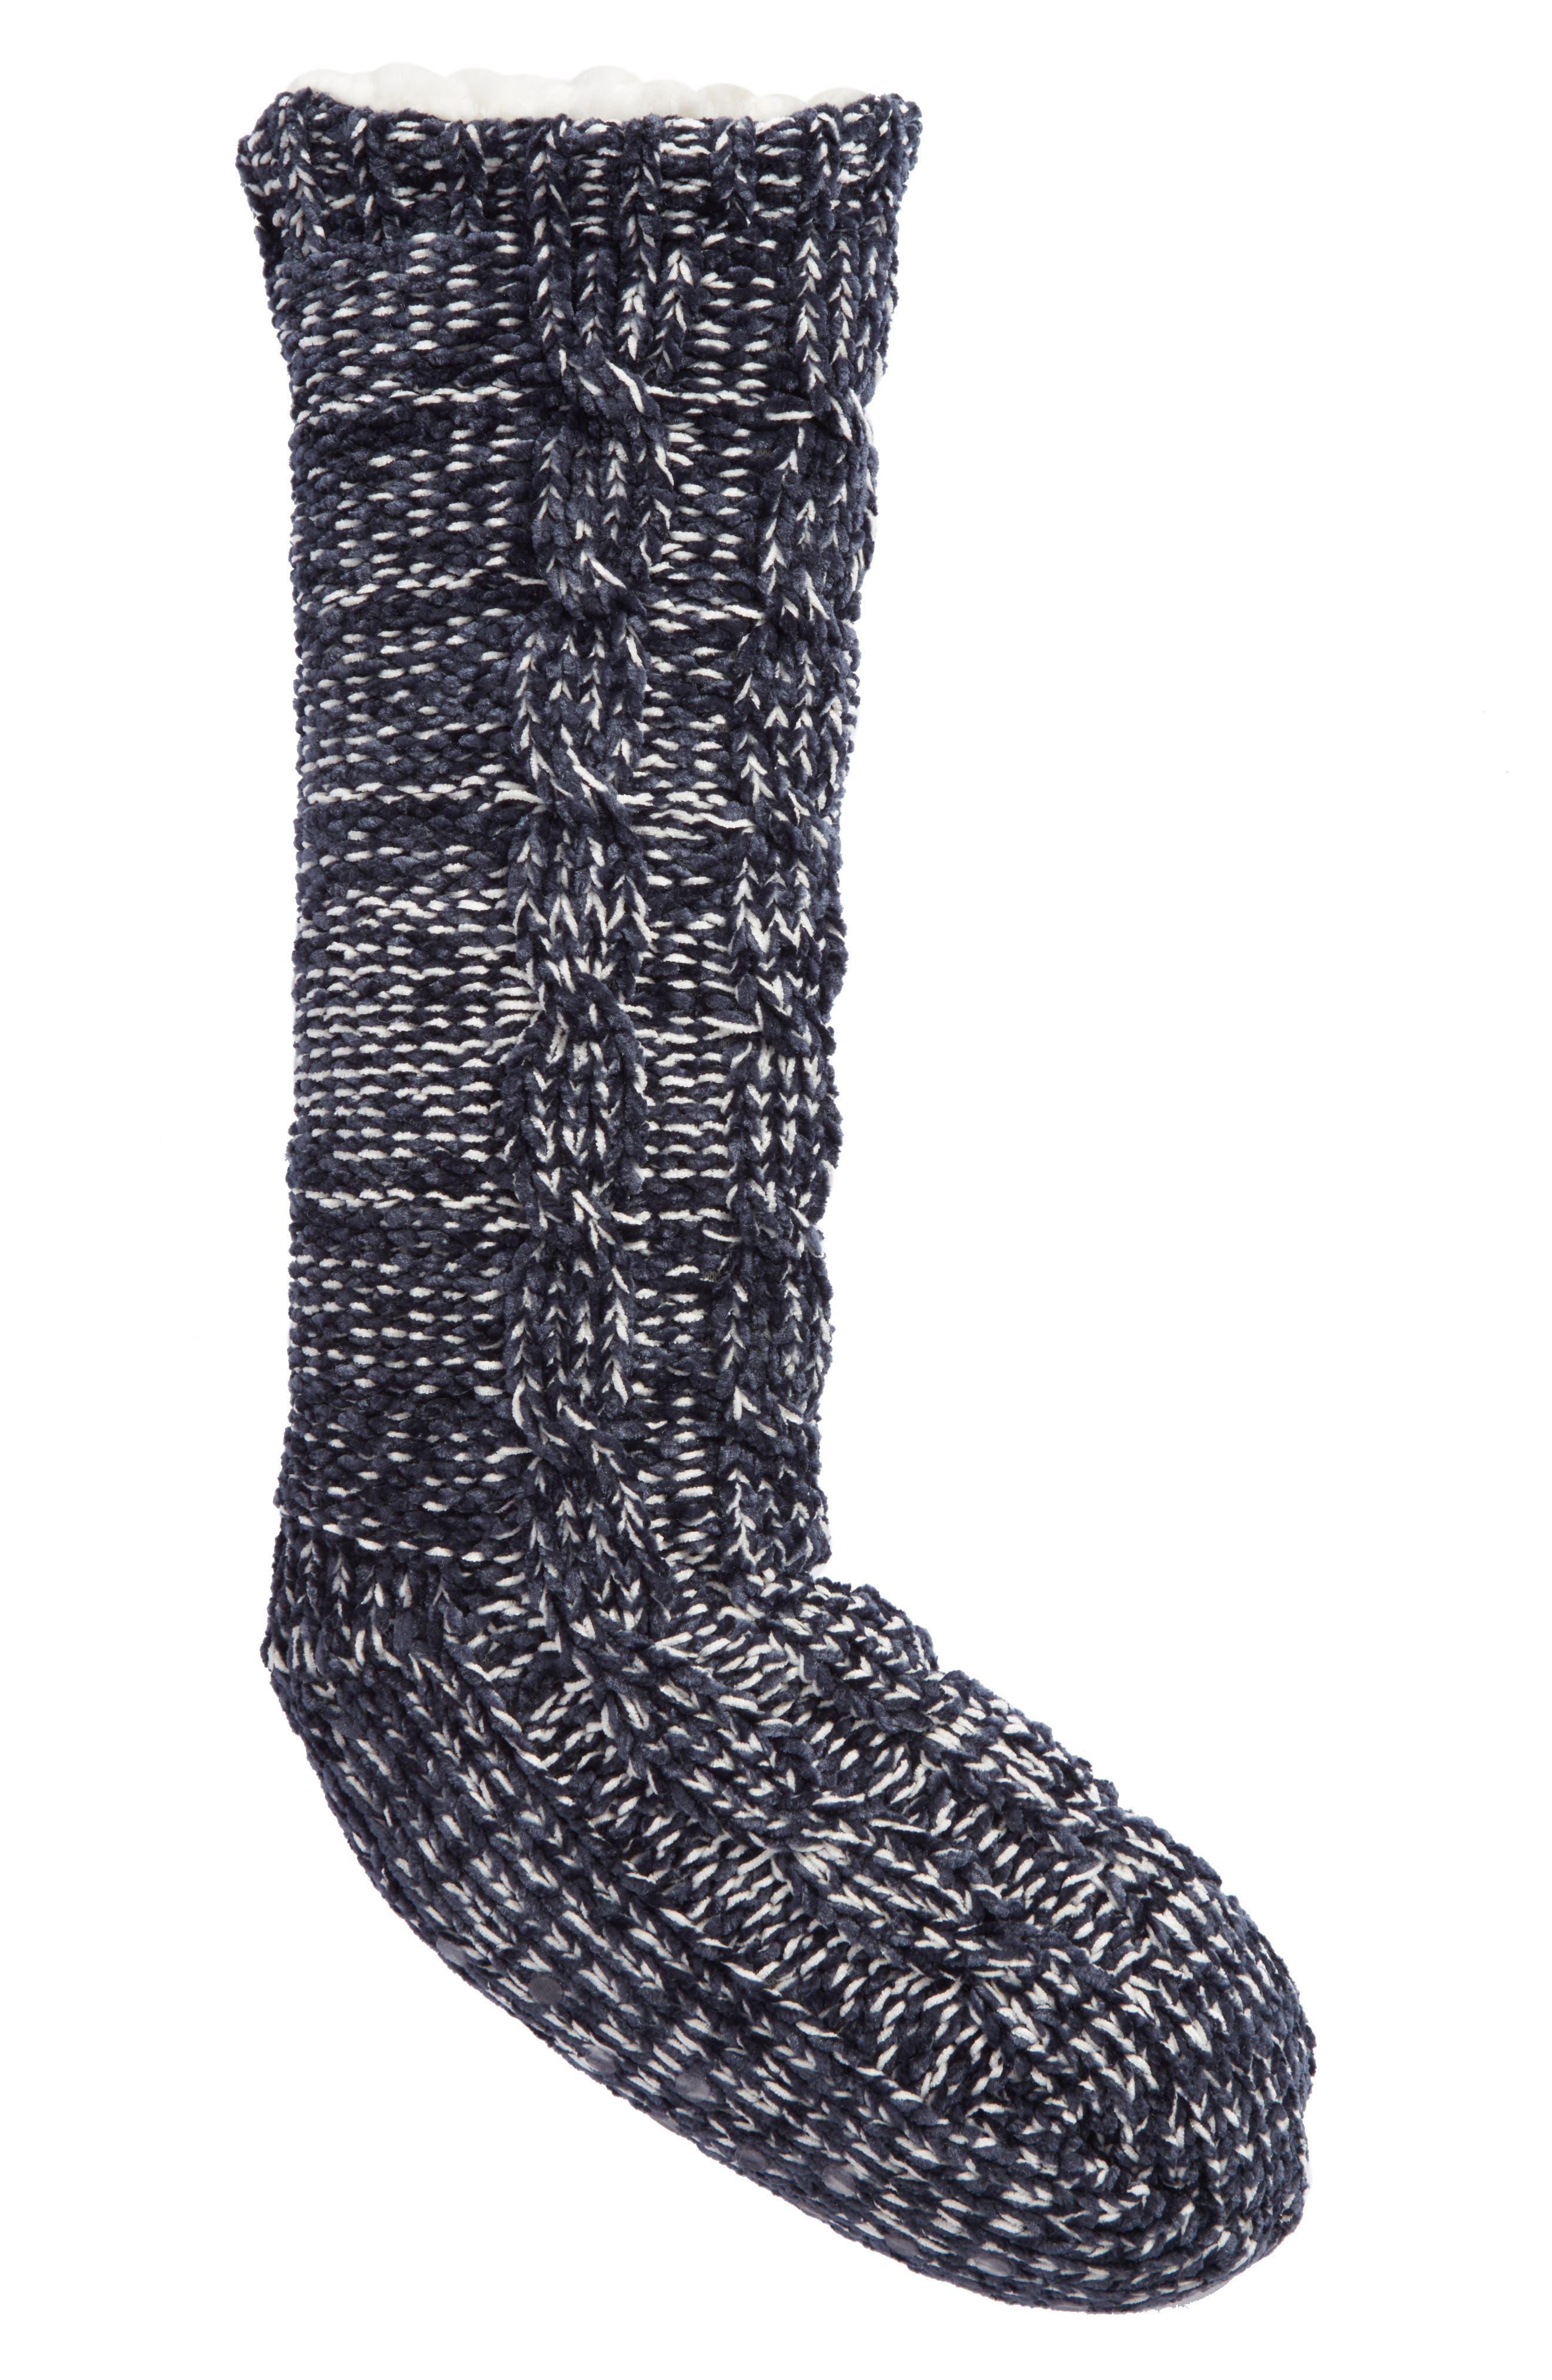 Main Image - Make + Model Cable Knit Slipper Socks